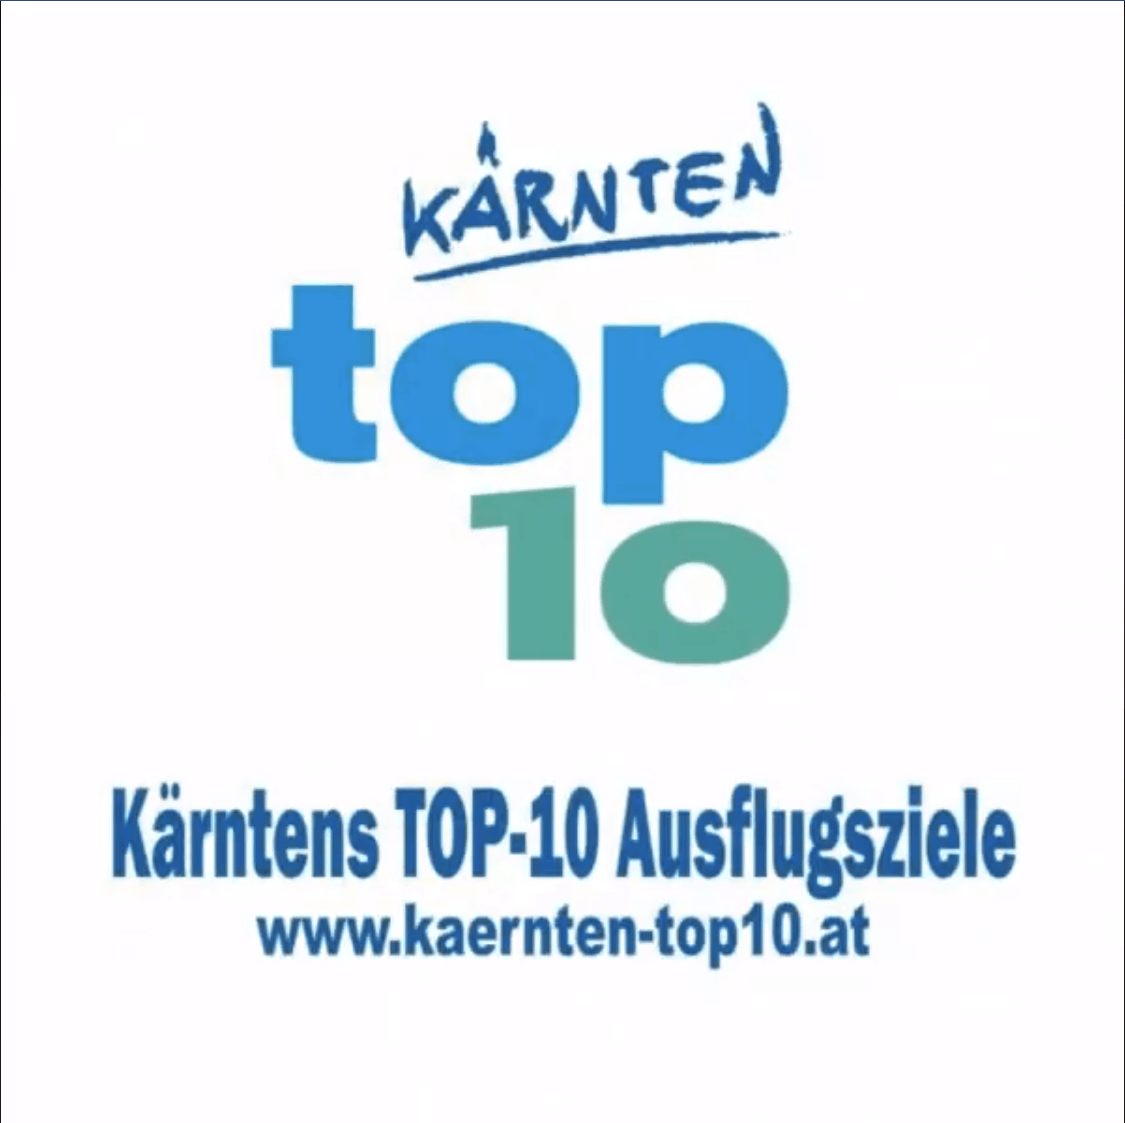 Kärntens geöffnete Sehenswürdigkeiten im Frühling April Mai - Logo Web Kontakt